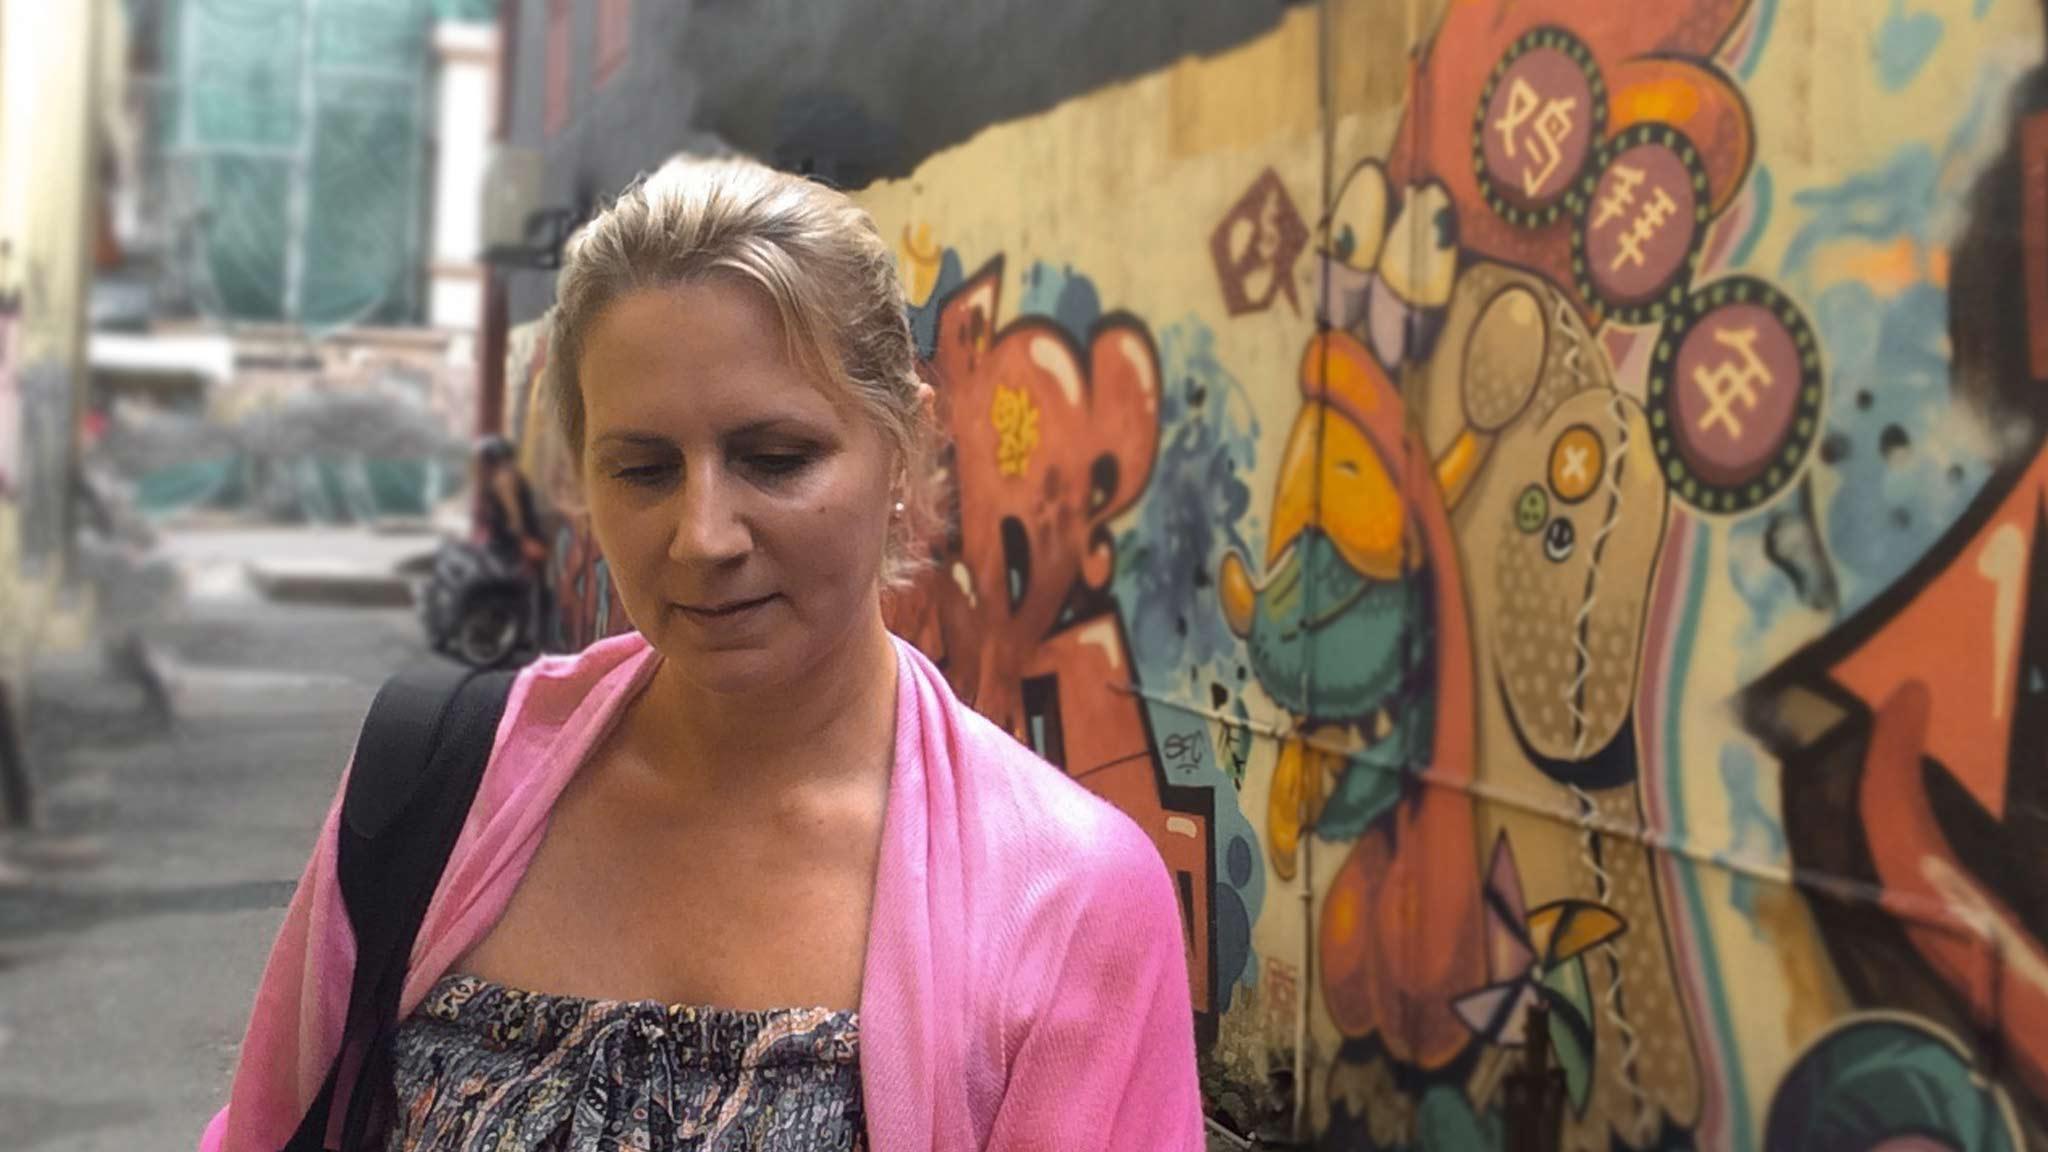 Empty Nest Syndrome for Single Moms: Feeling Needy & Forgotten